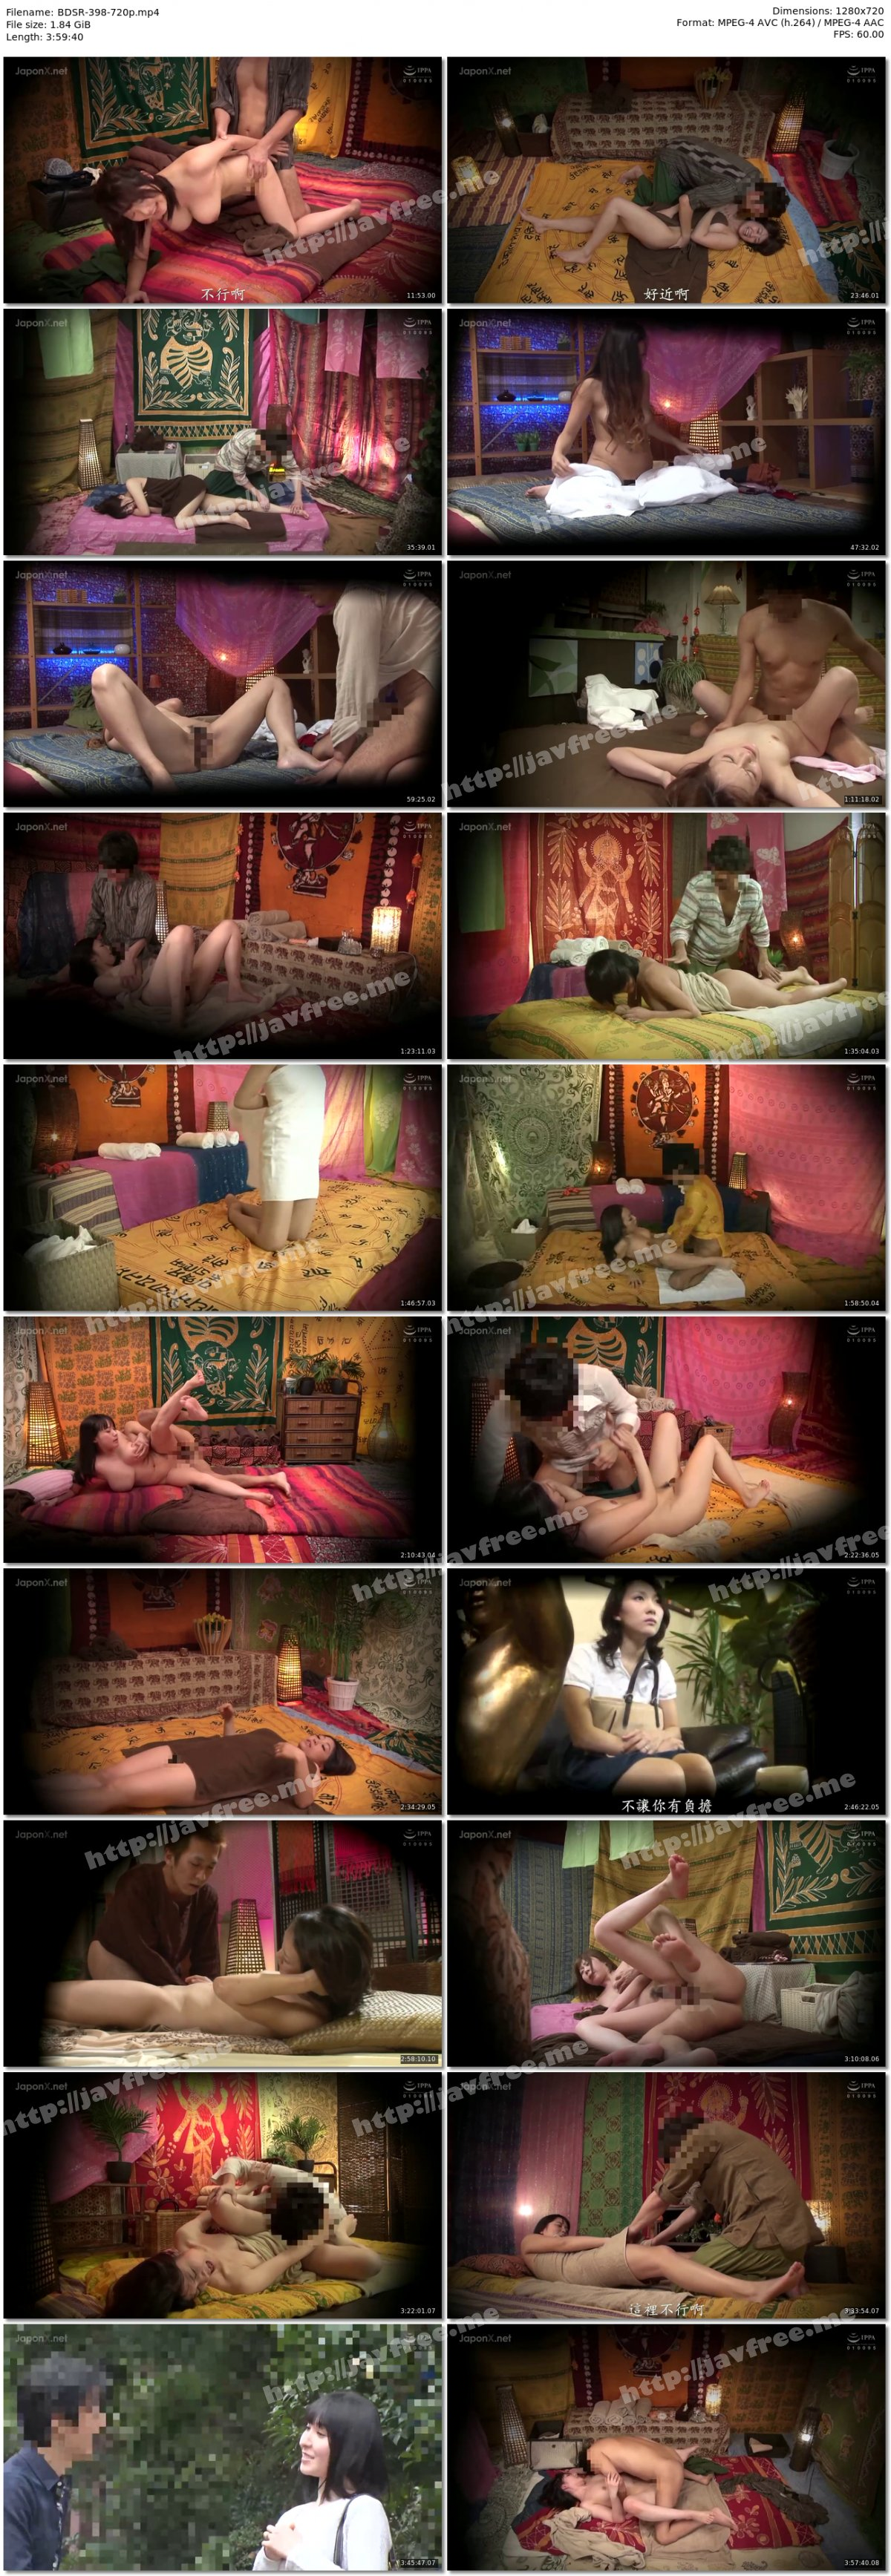 [HD][KNMD-033] 現代における奇譚な男女の物語 高宮菜々子 - image BDSR-398-720p on https://javfree.me